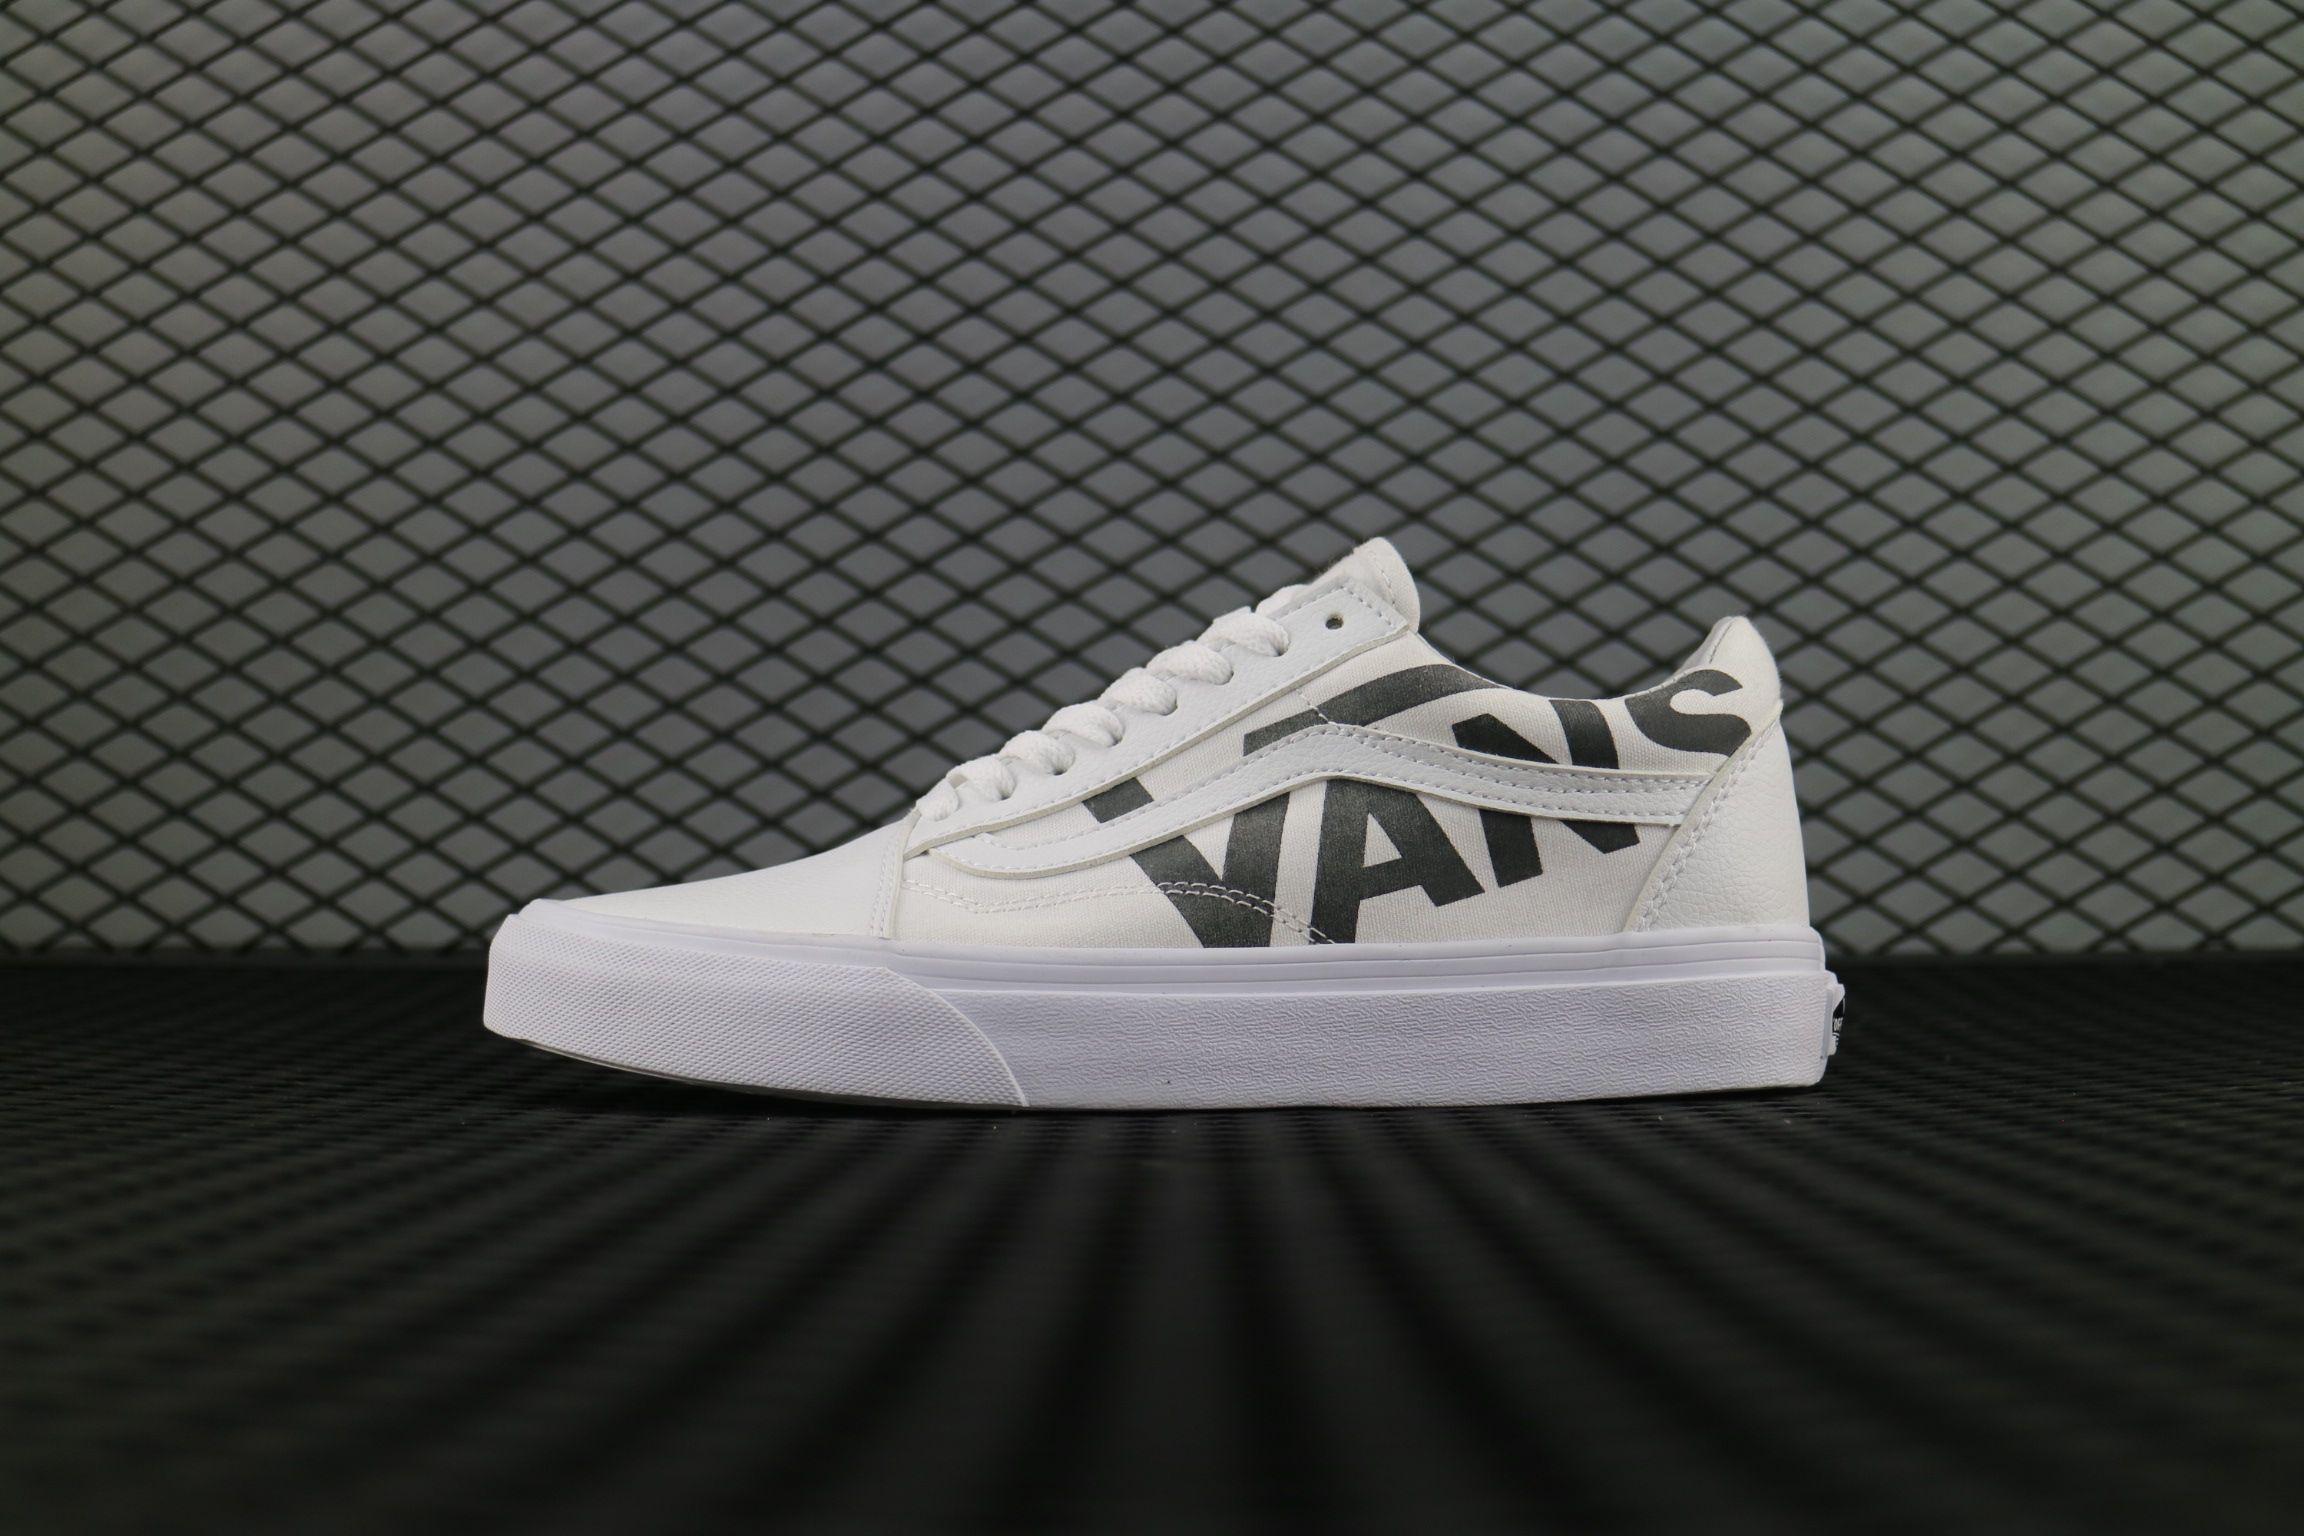 Vans Old Skool ShowRoom 21 30 White Vans Shoe For Sale  Vans ... fa4a491dd